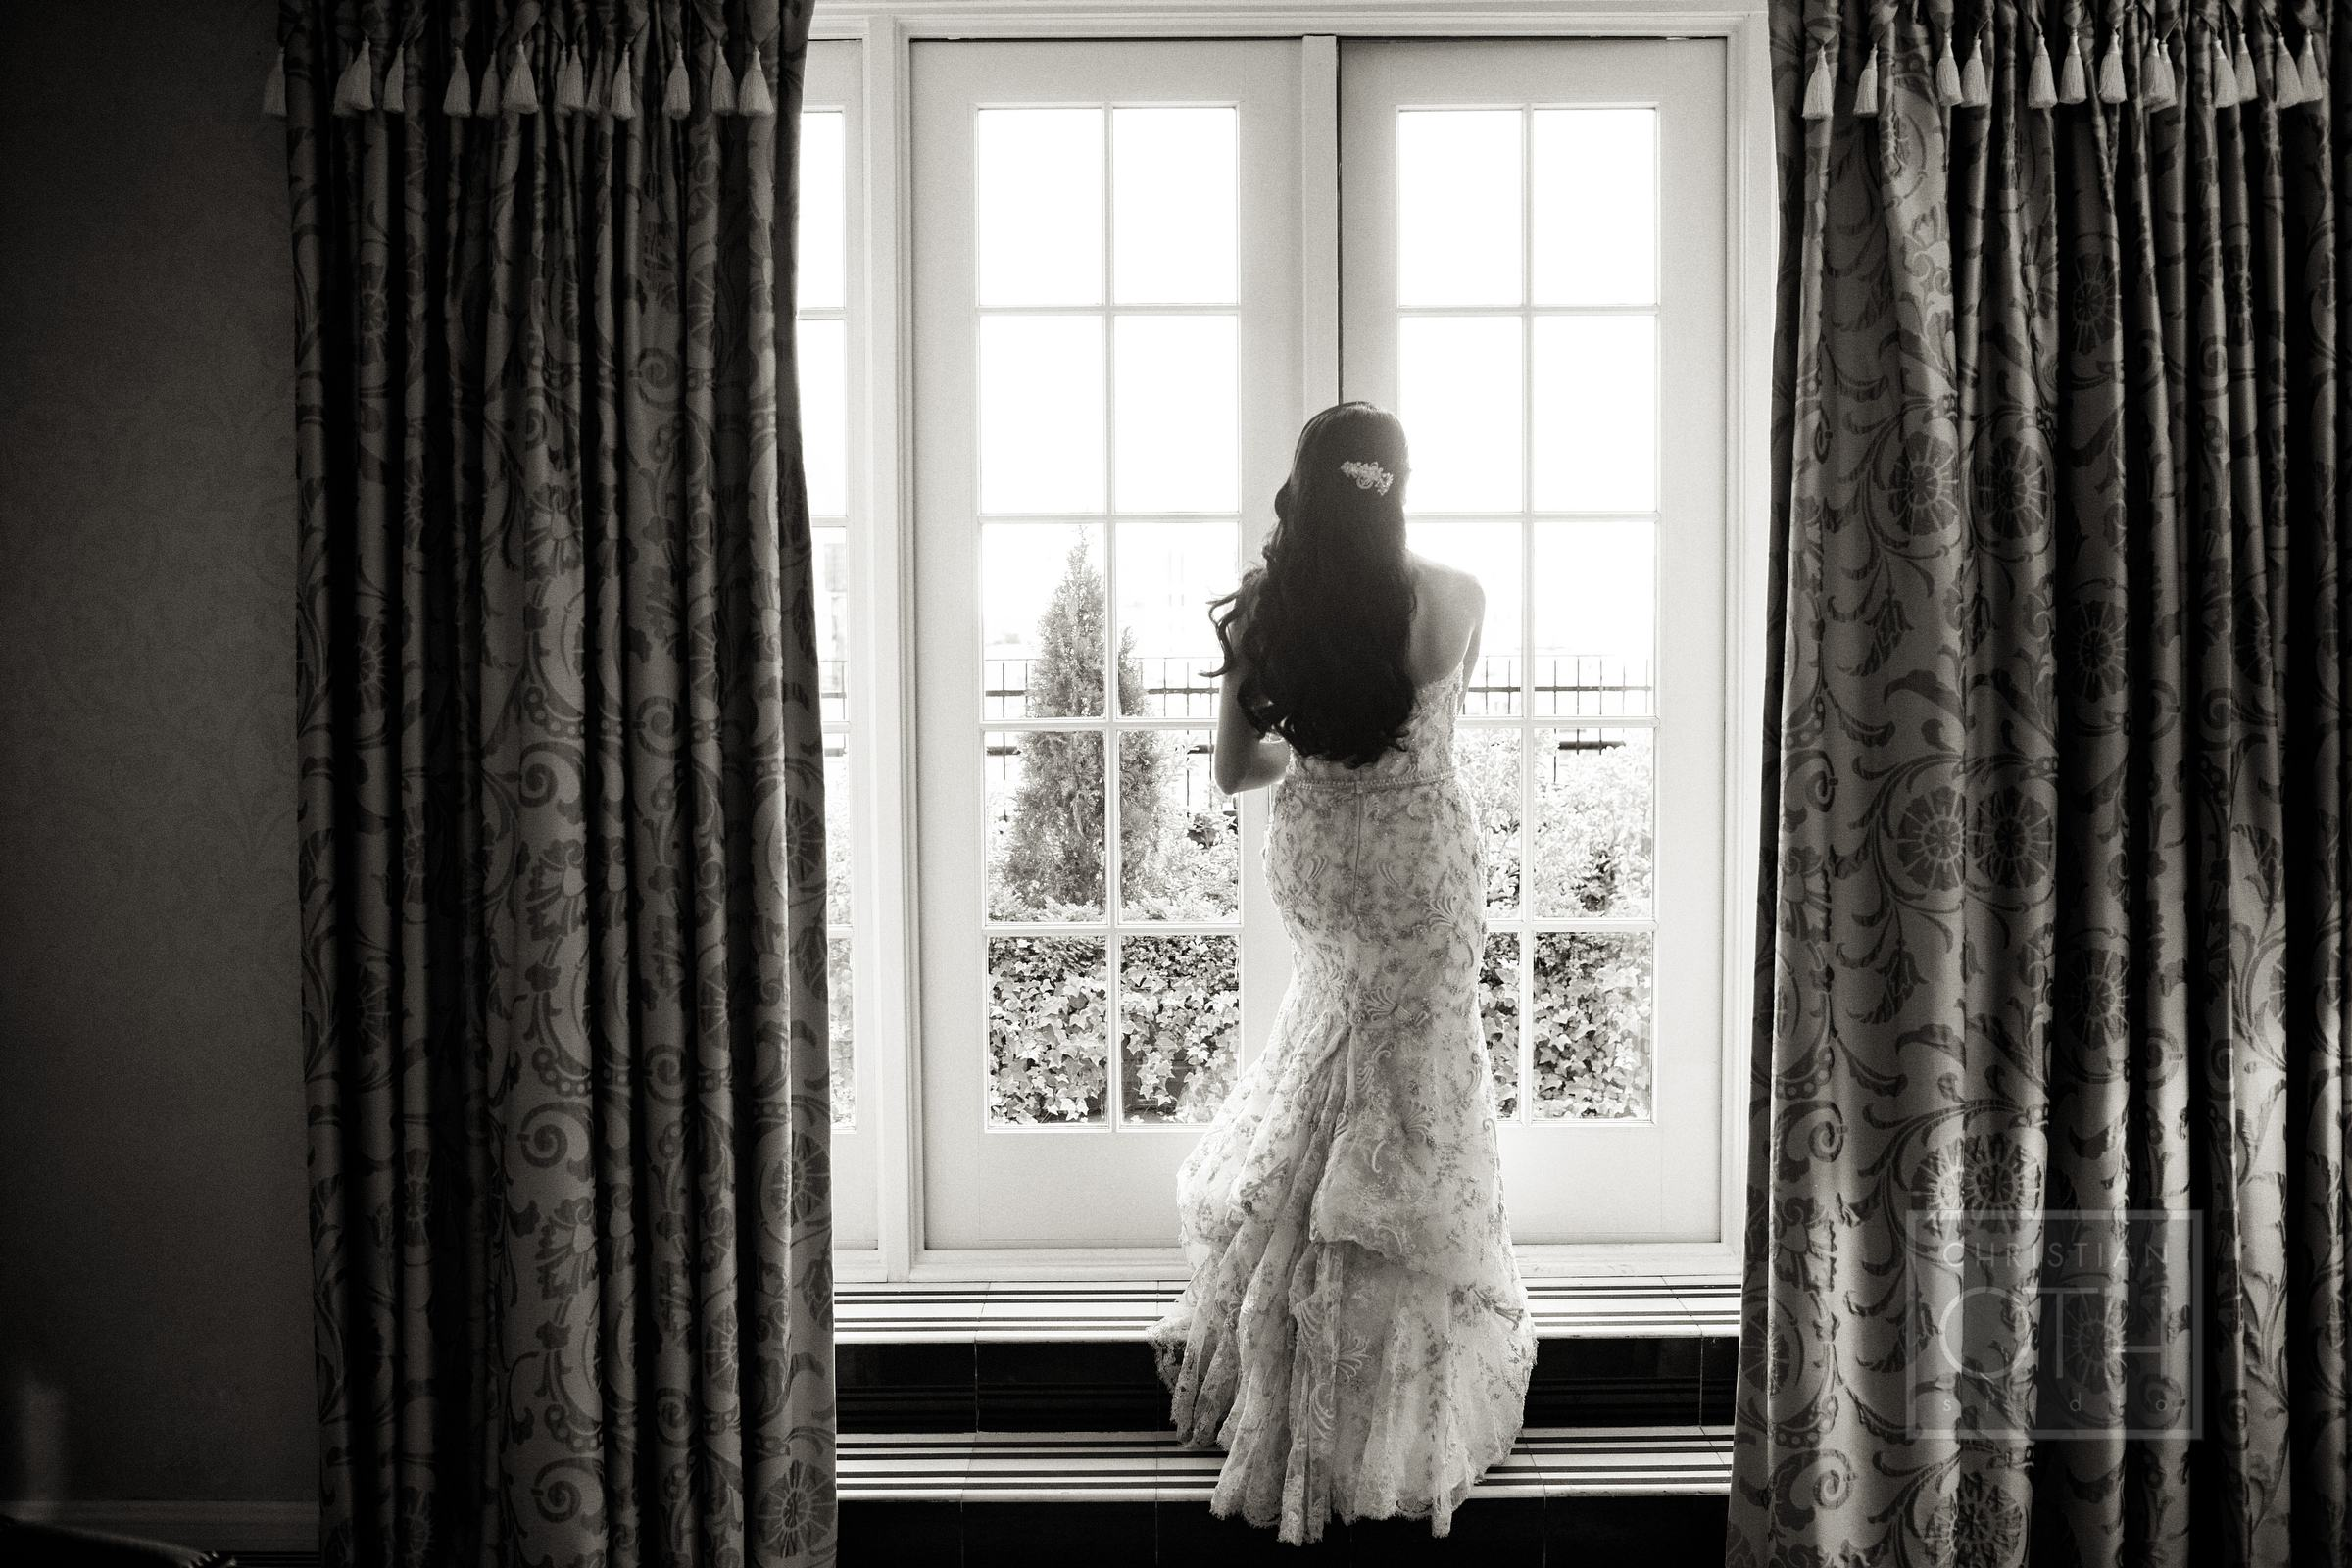 Ceci_New_York_Custom_Invitation_Pierre__City_ Destination_Wedding_Luxury_Personalized_Ceci_Style_Bride_Rose_Gold_Foil_Stamping24.JPG